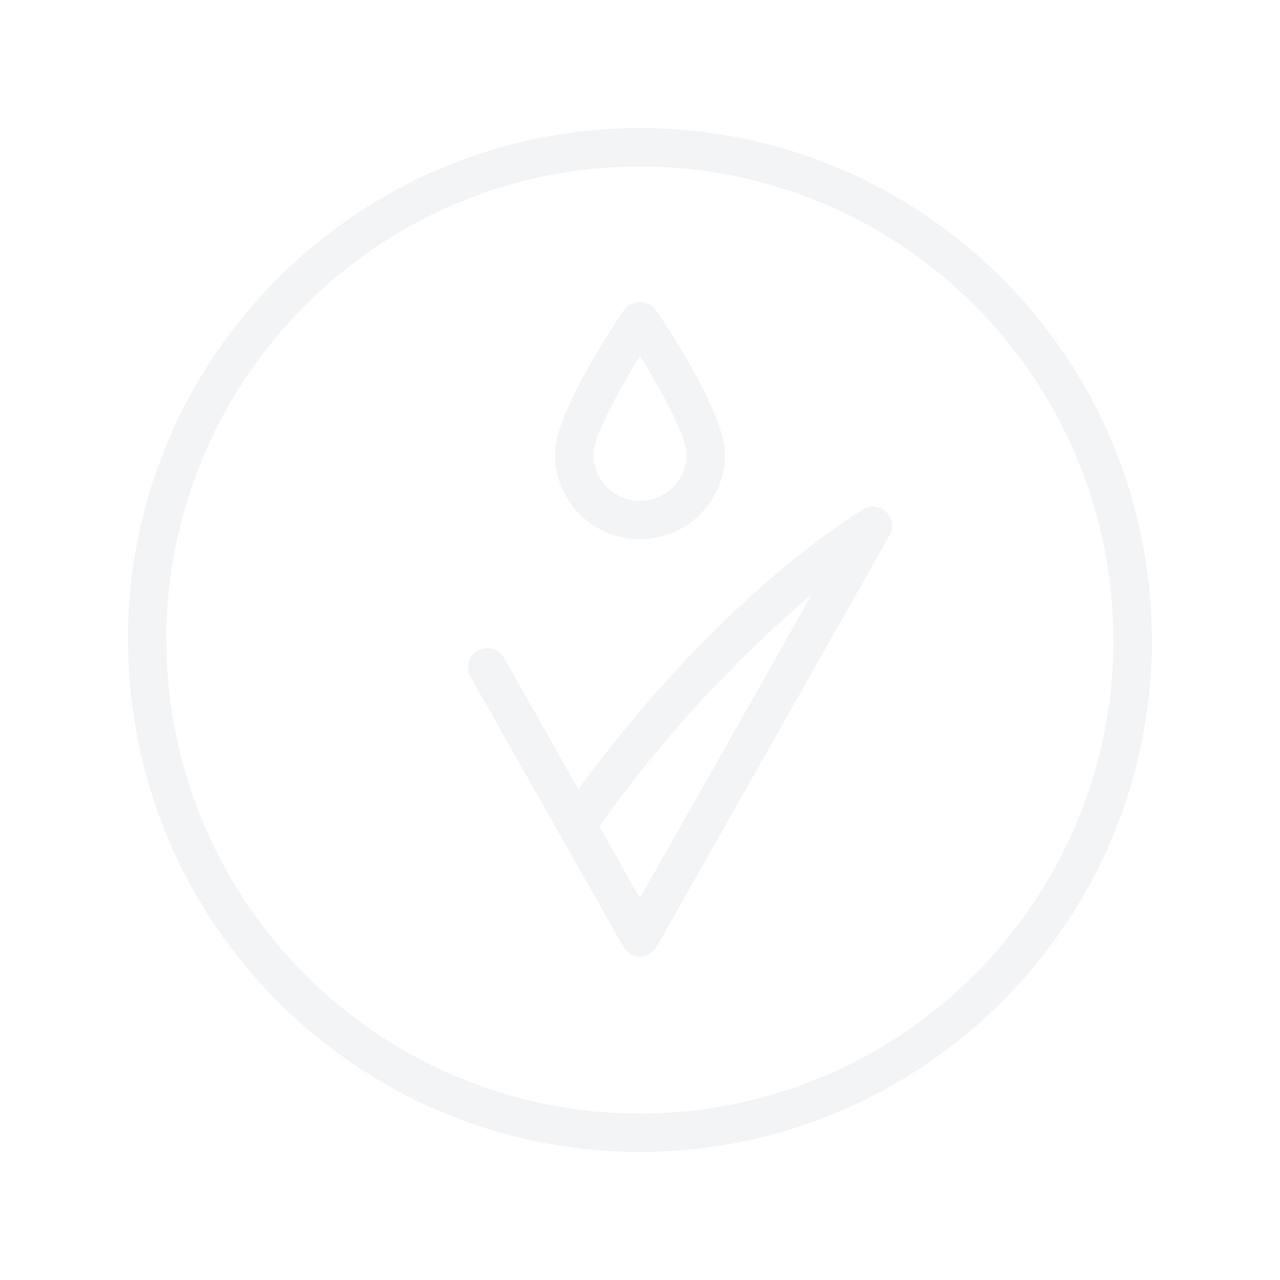 LÖWENGRIP Sensitive Roll-On Deodorant 50ml